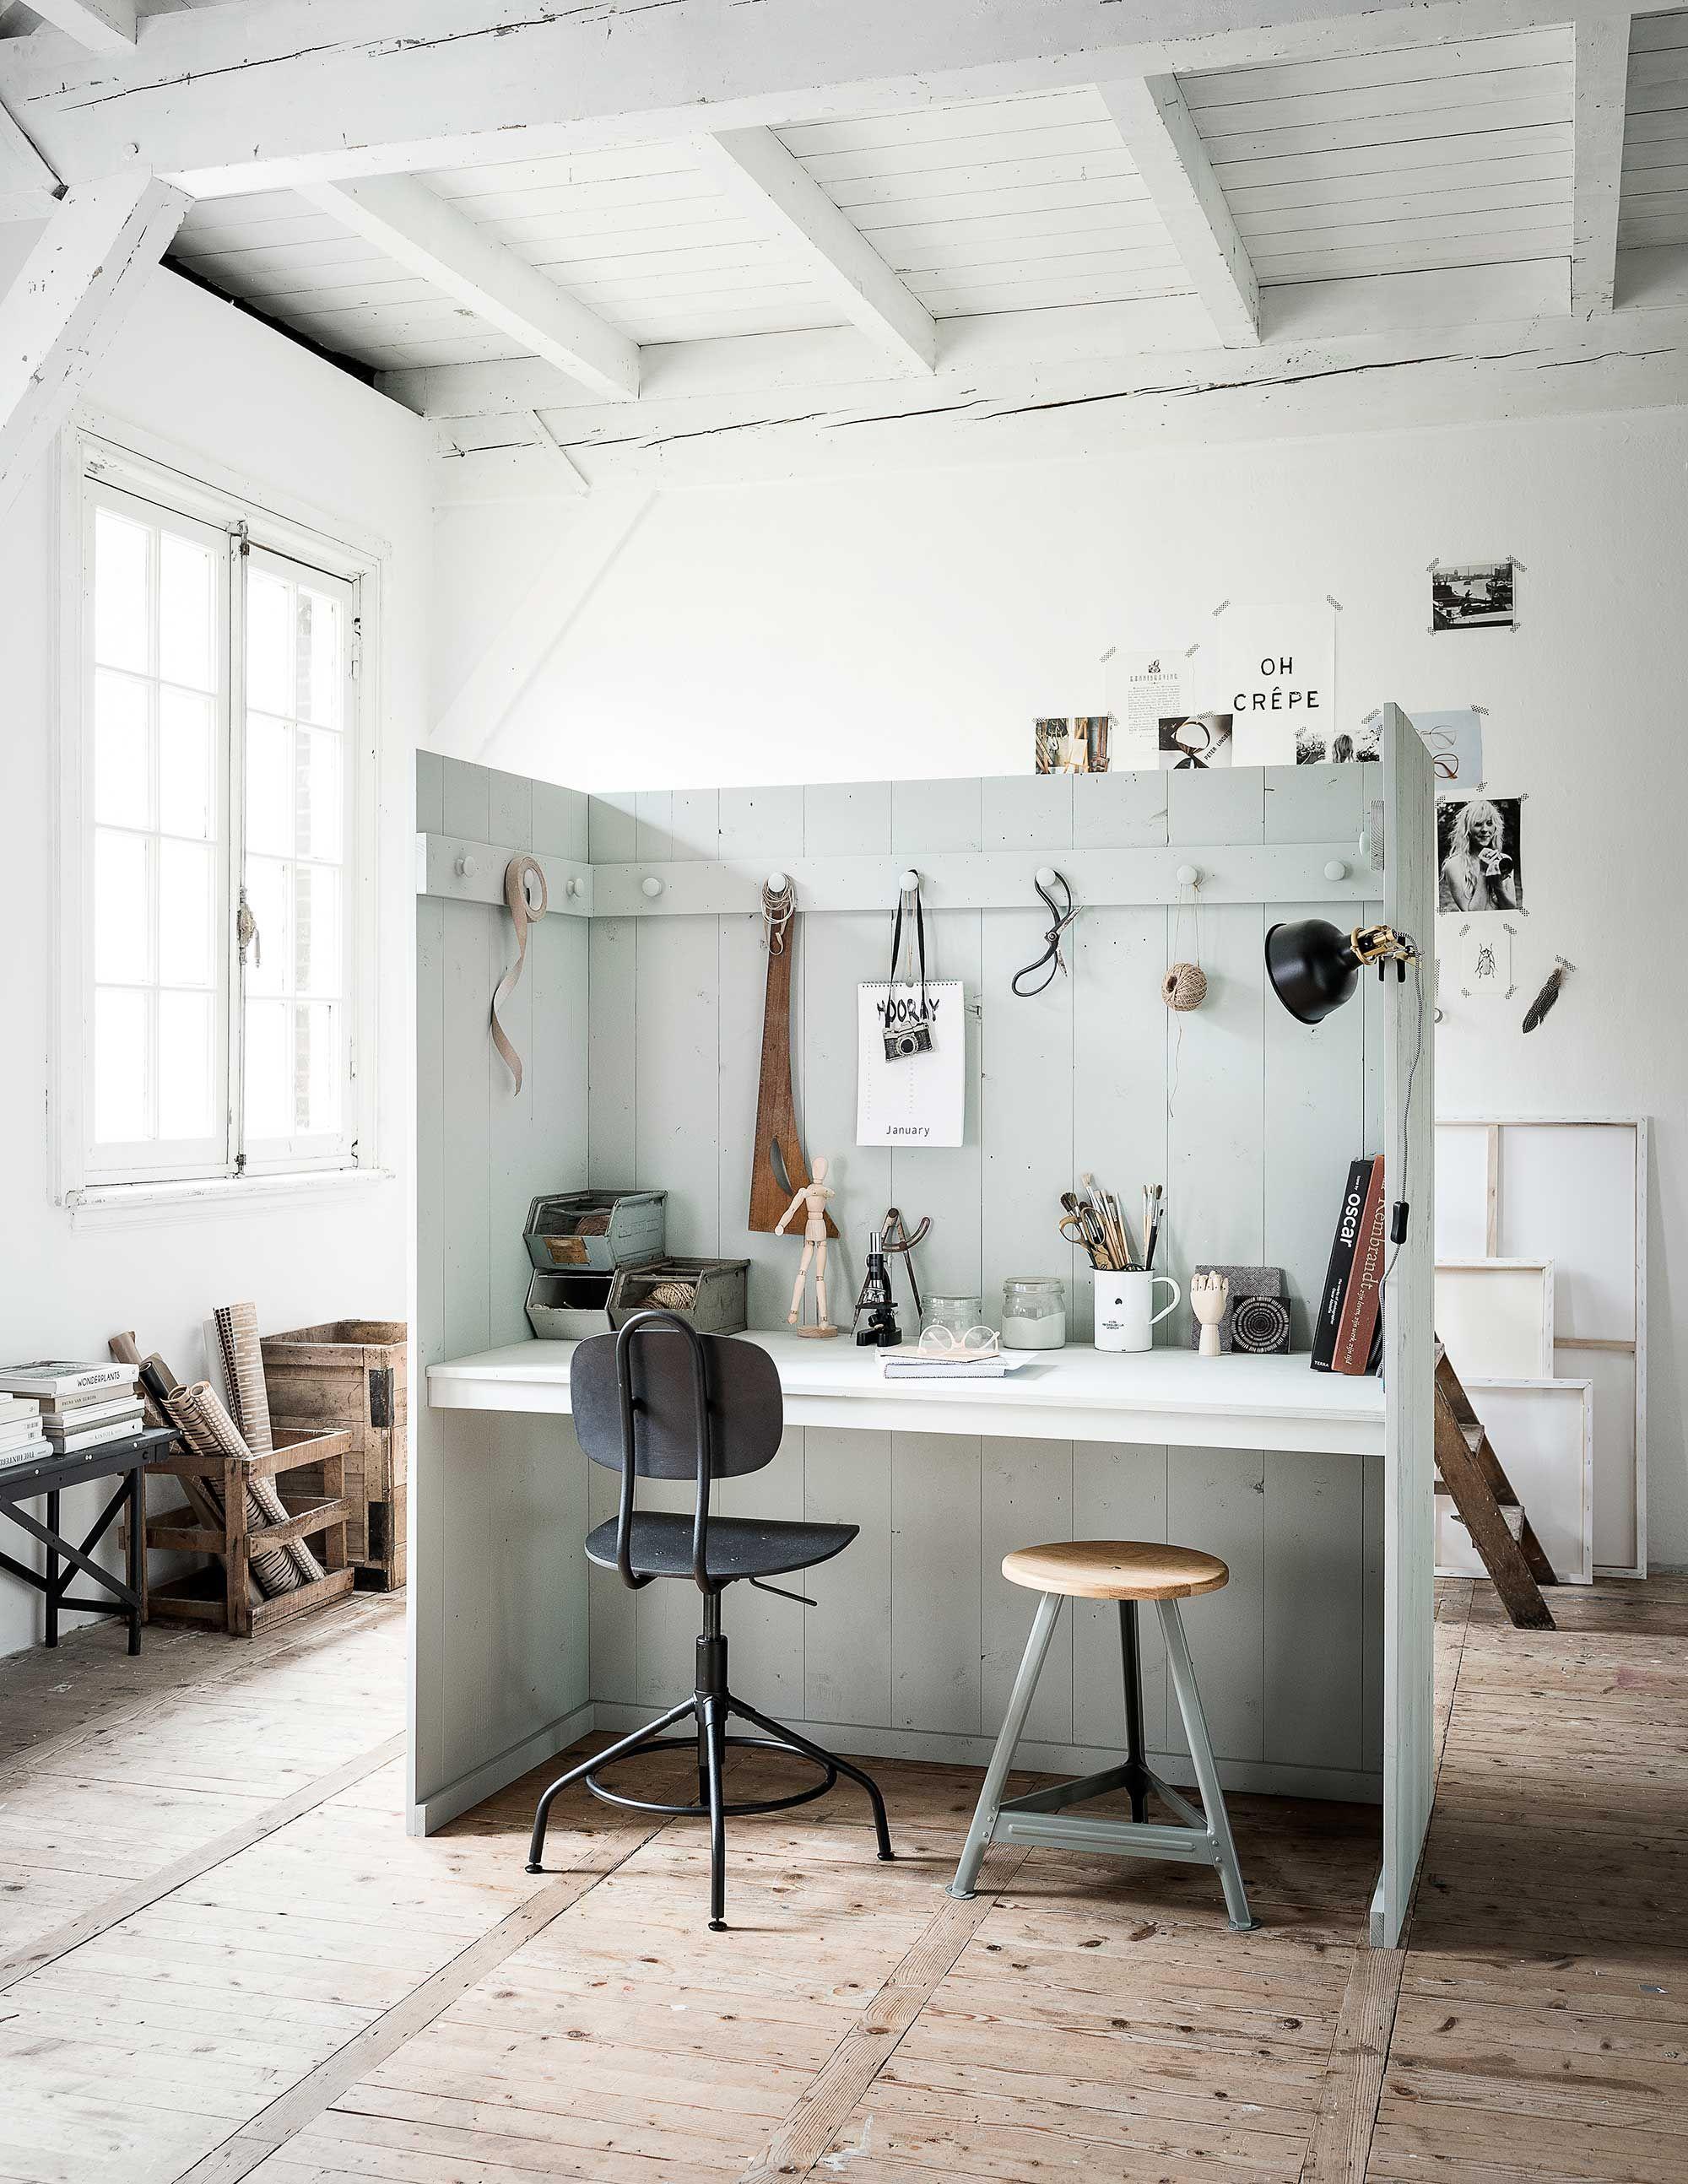 diy multifunctionele priv werkplek diy multifunctional private workspace vtwonen 09 2017. Black Bedroom Furniture Sets. Home Design Ideas